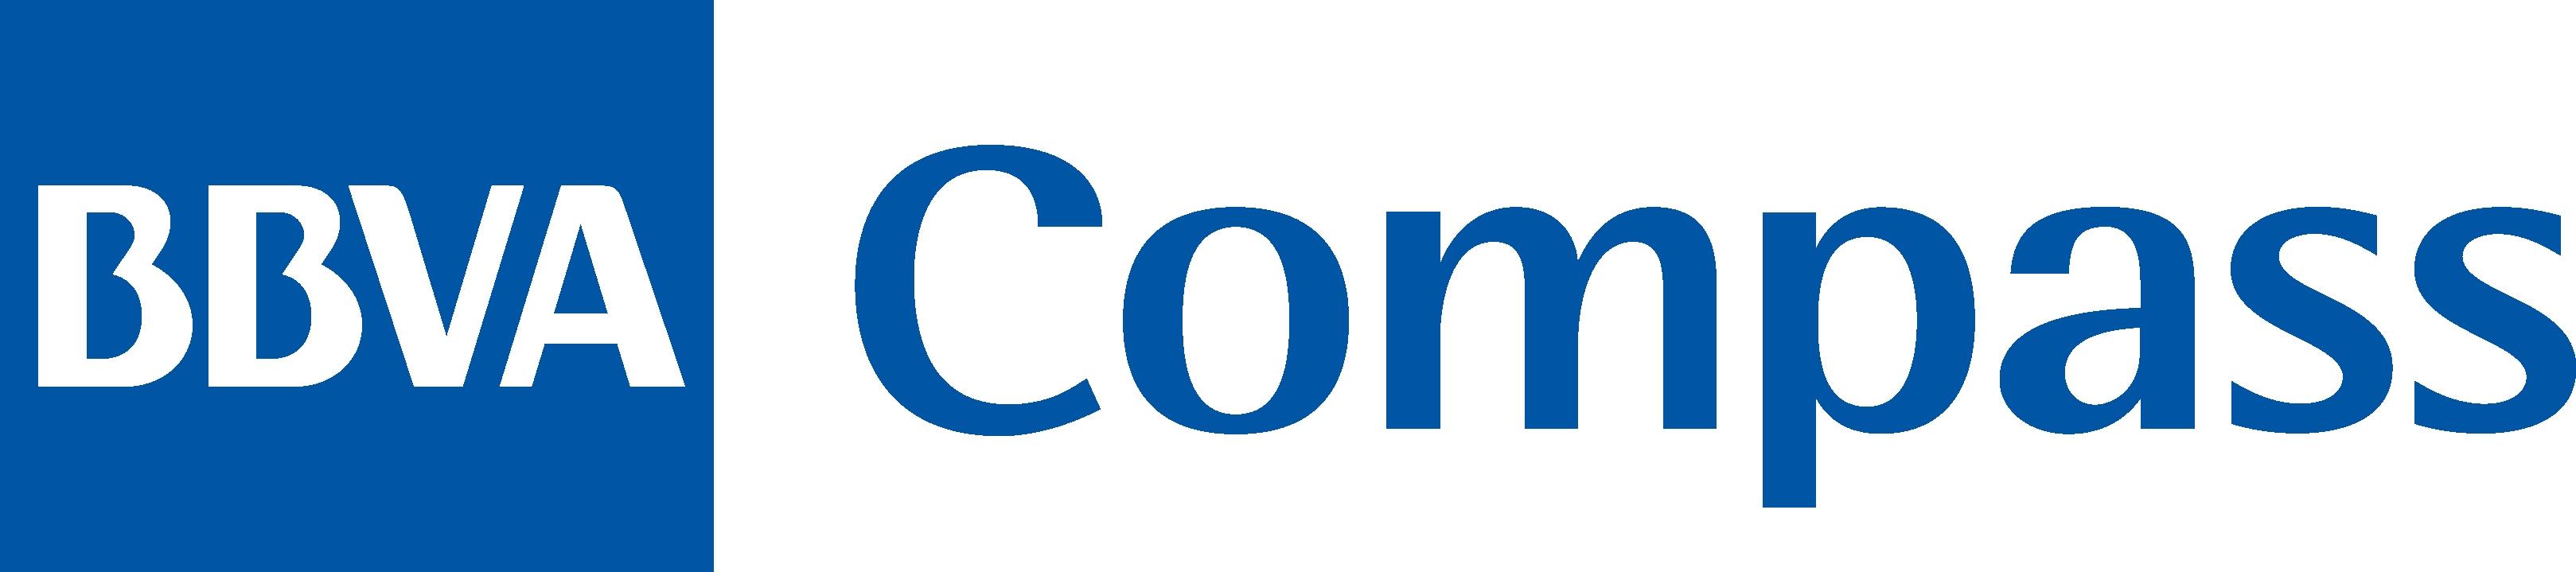 BBVA Compass Logo photo - 1